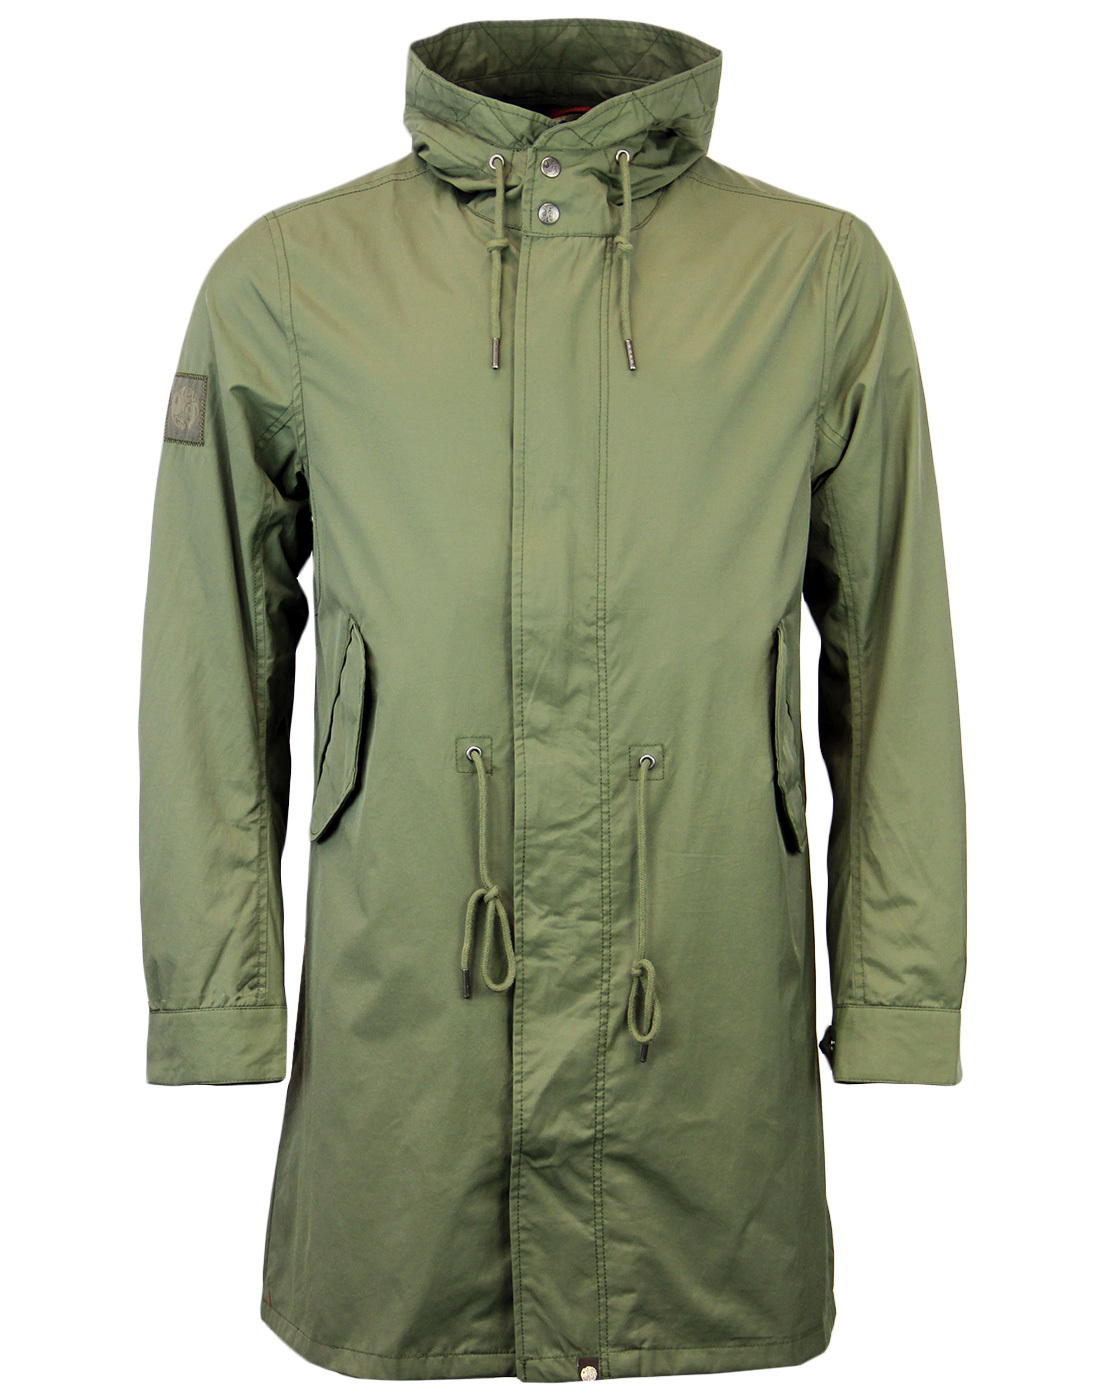 Mod Parka Coats - JacketIn